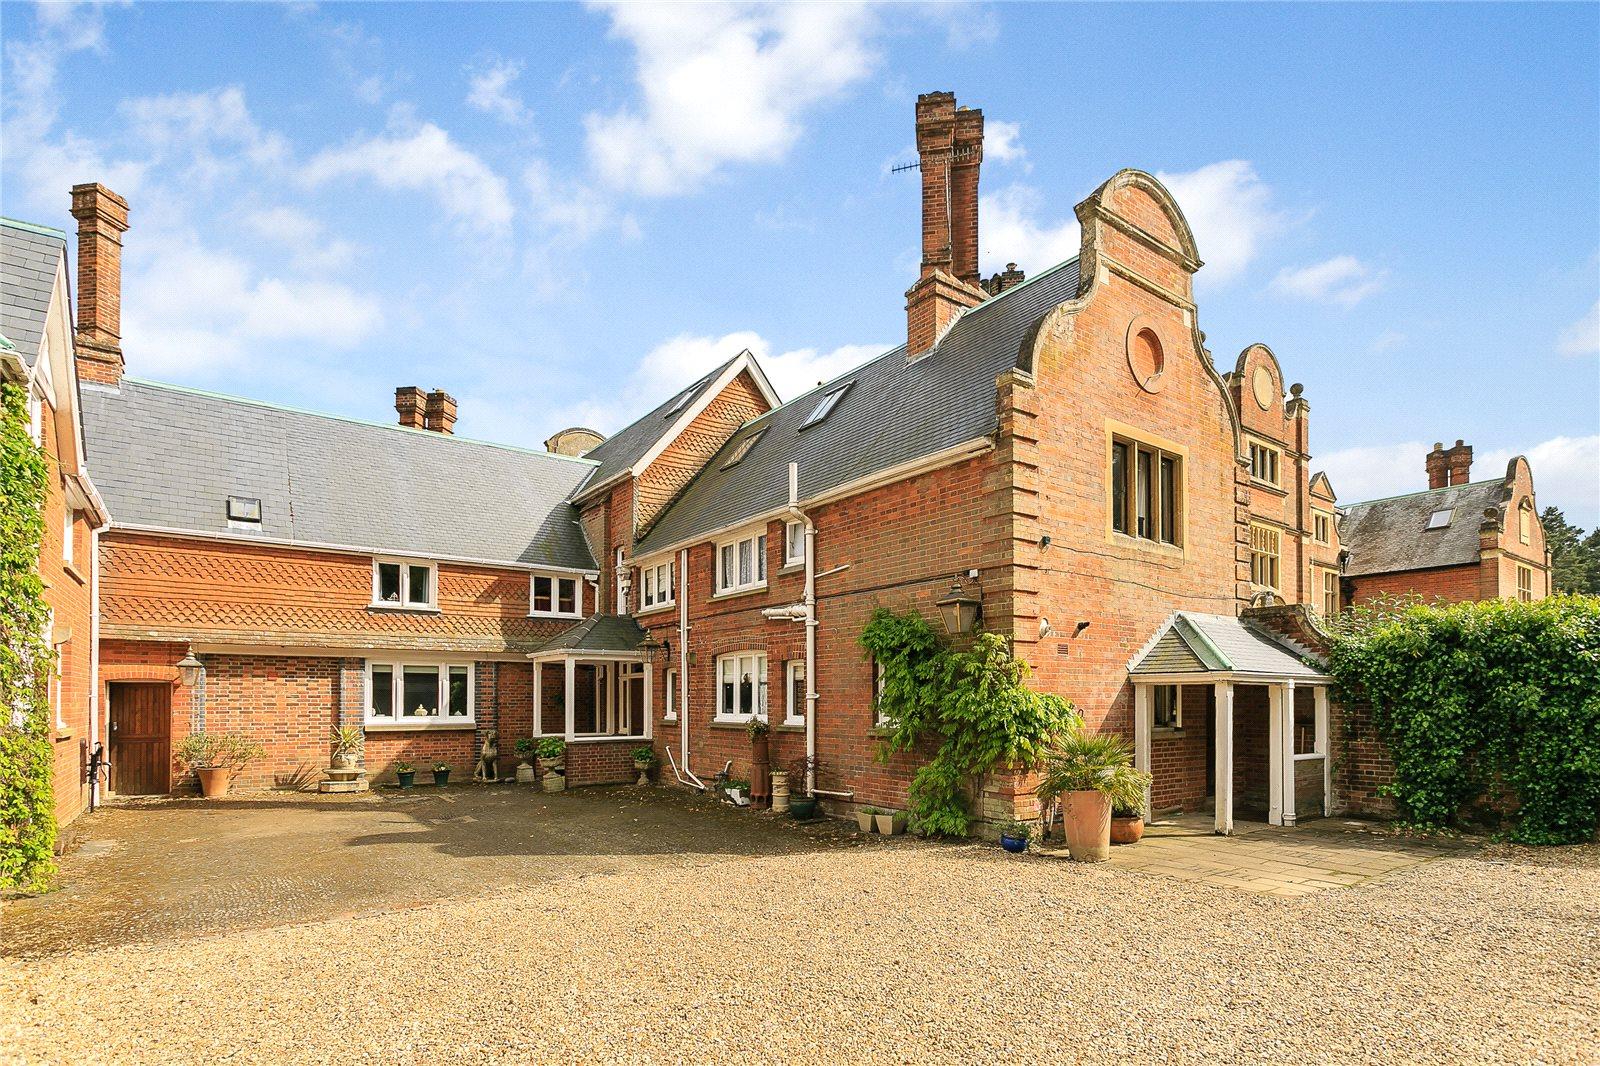 独户住宅 为 销售 在 Tilford, Farnham, Surrey, GU10 Farnham, 英格兰